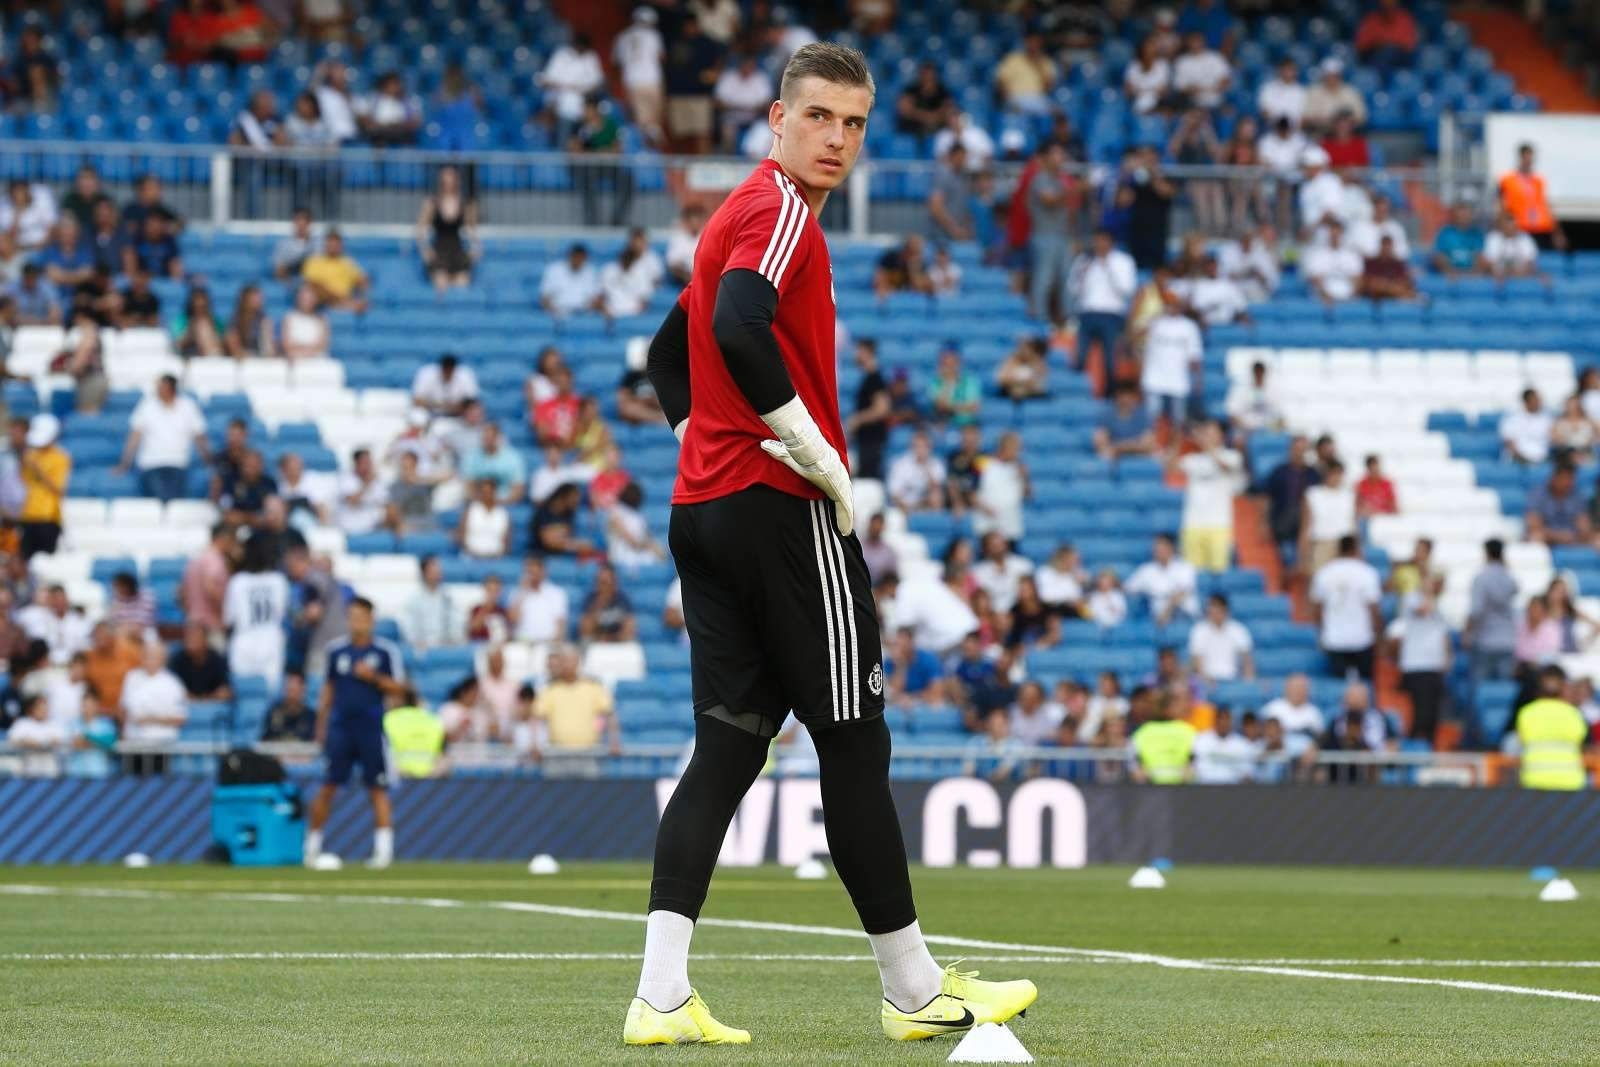 Лунин: «Я был впечатлён Мадридом»